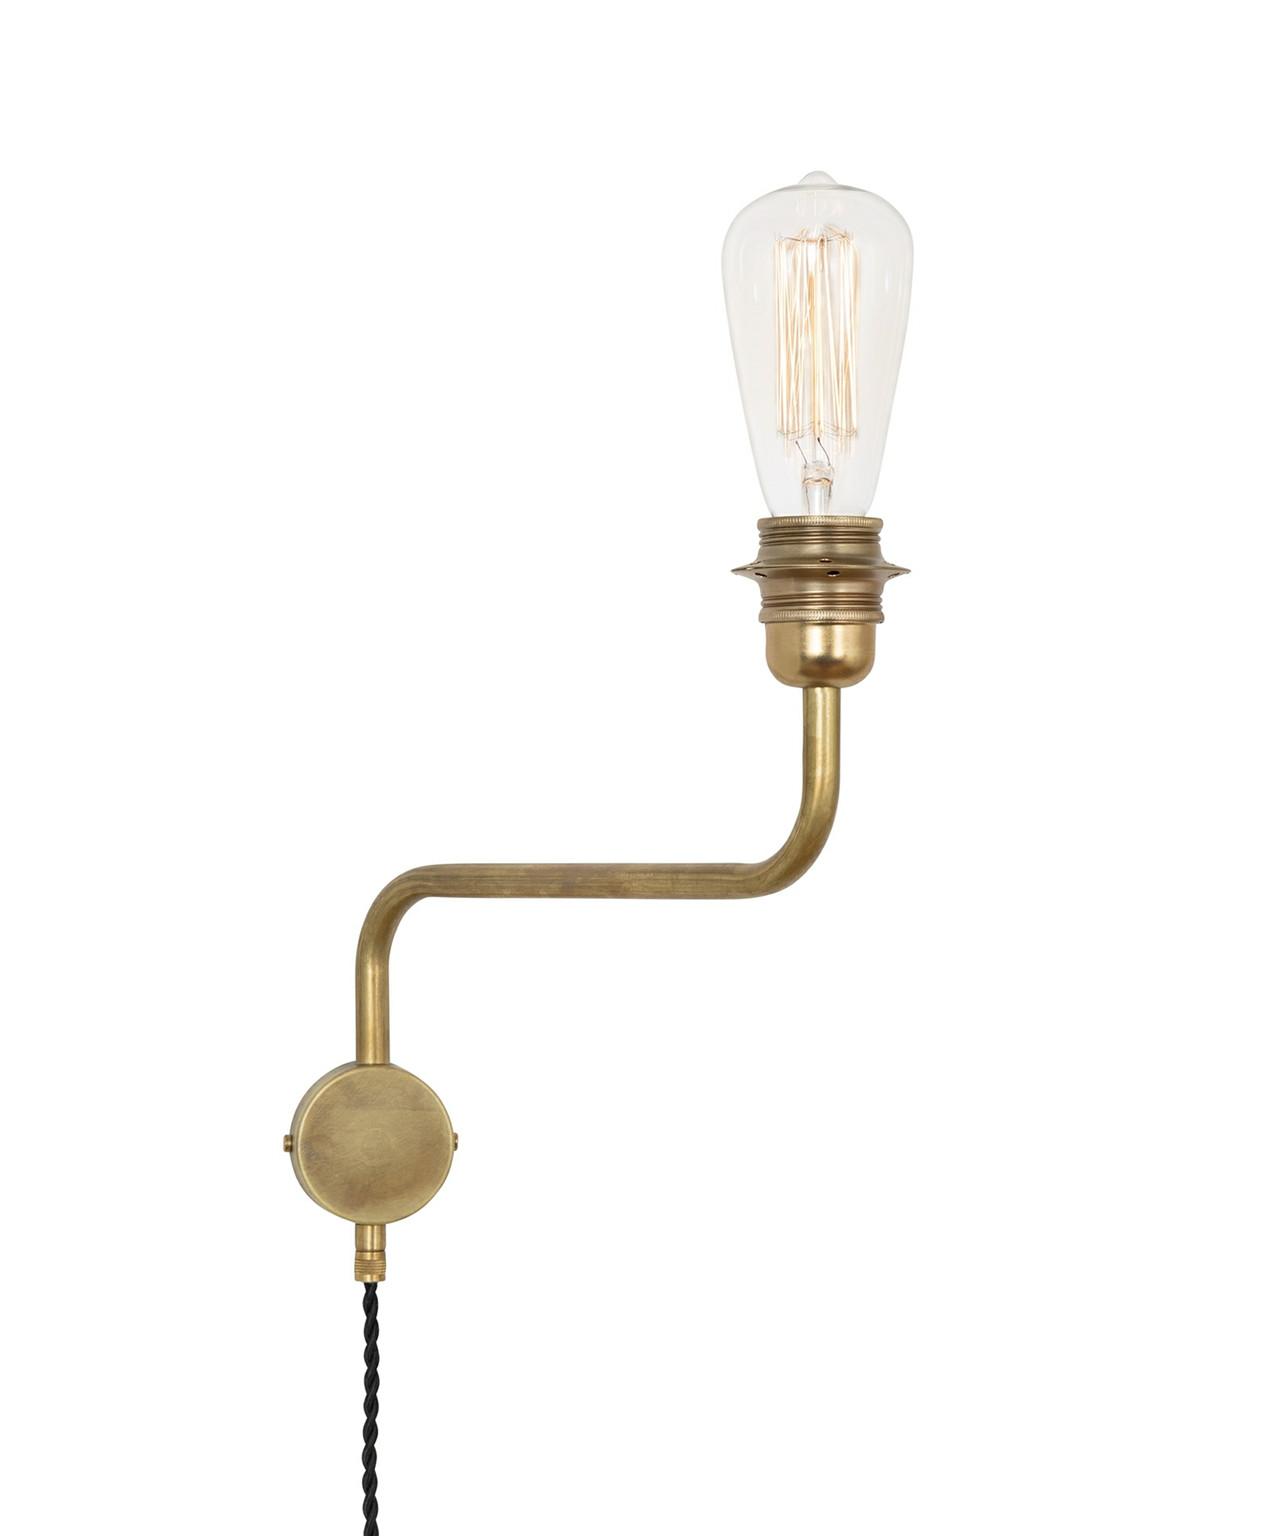 Edison væglampe up rå messing